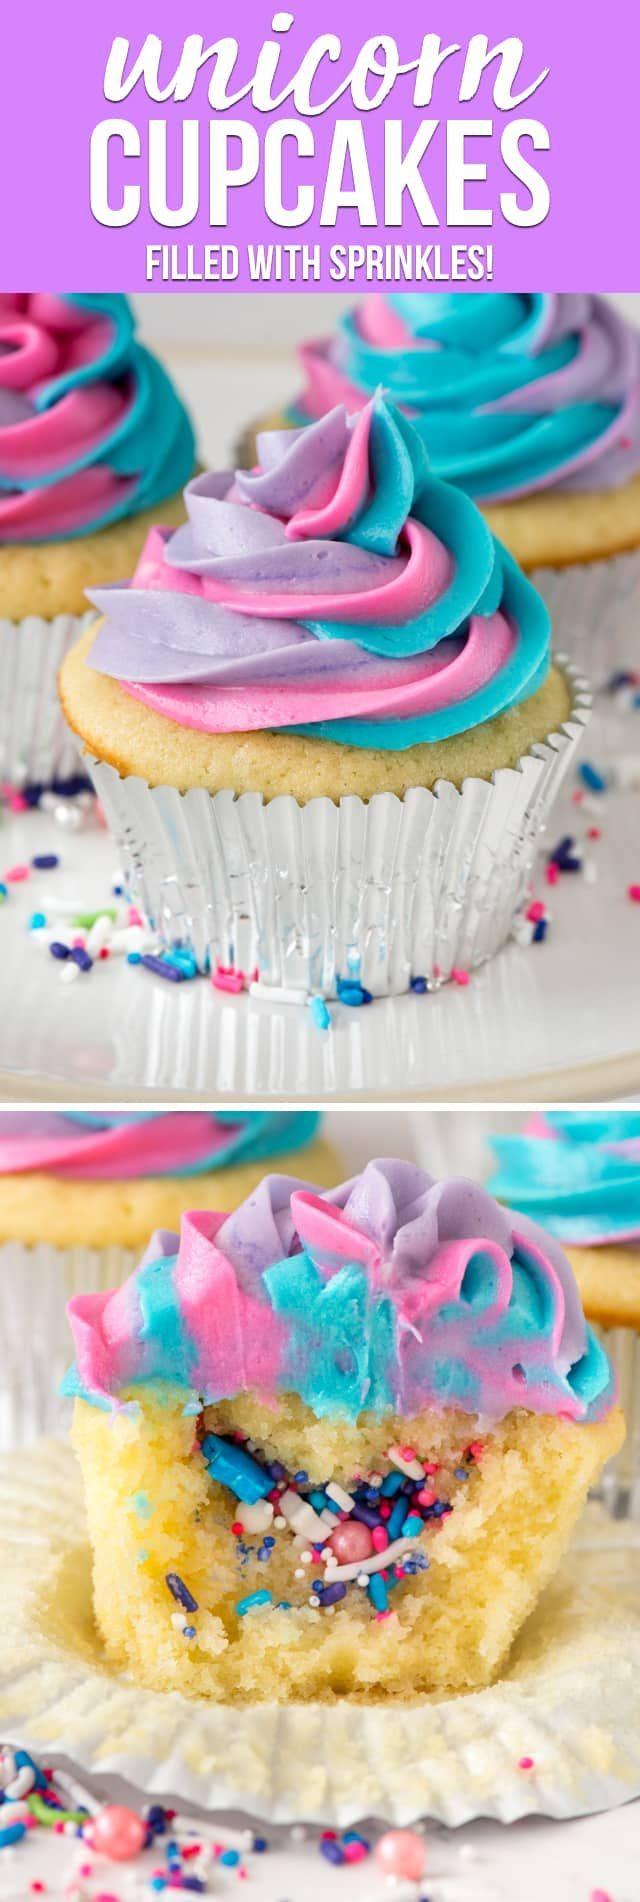 Unicorn Cupcakes are such a fun way to celebrate a birthday! Fill vanilla cupcak...   - Cupcakes -